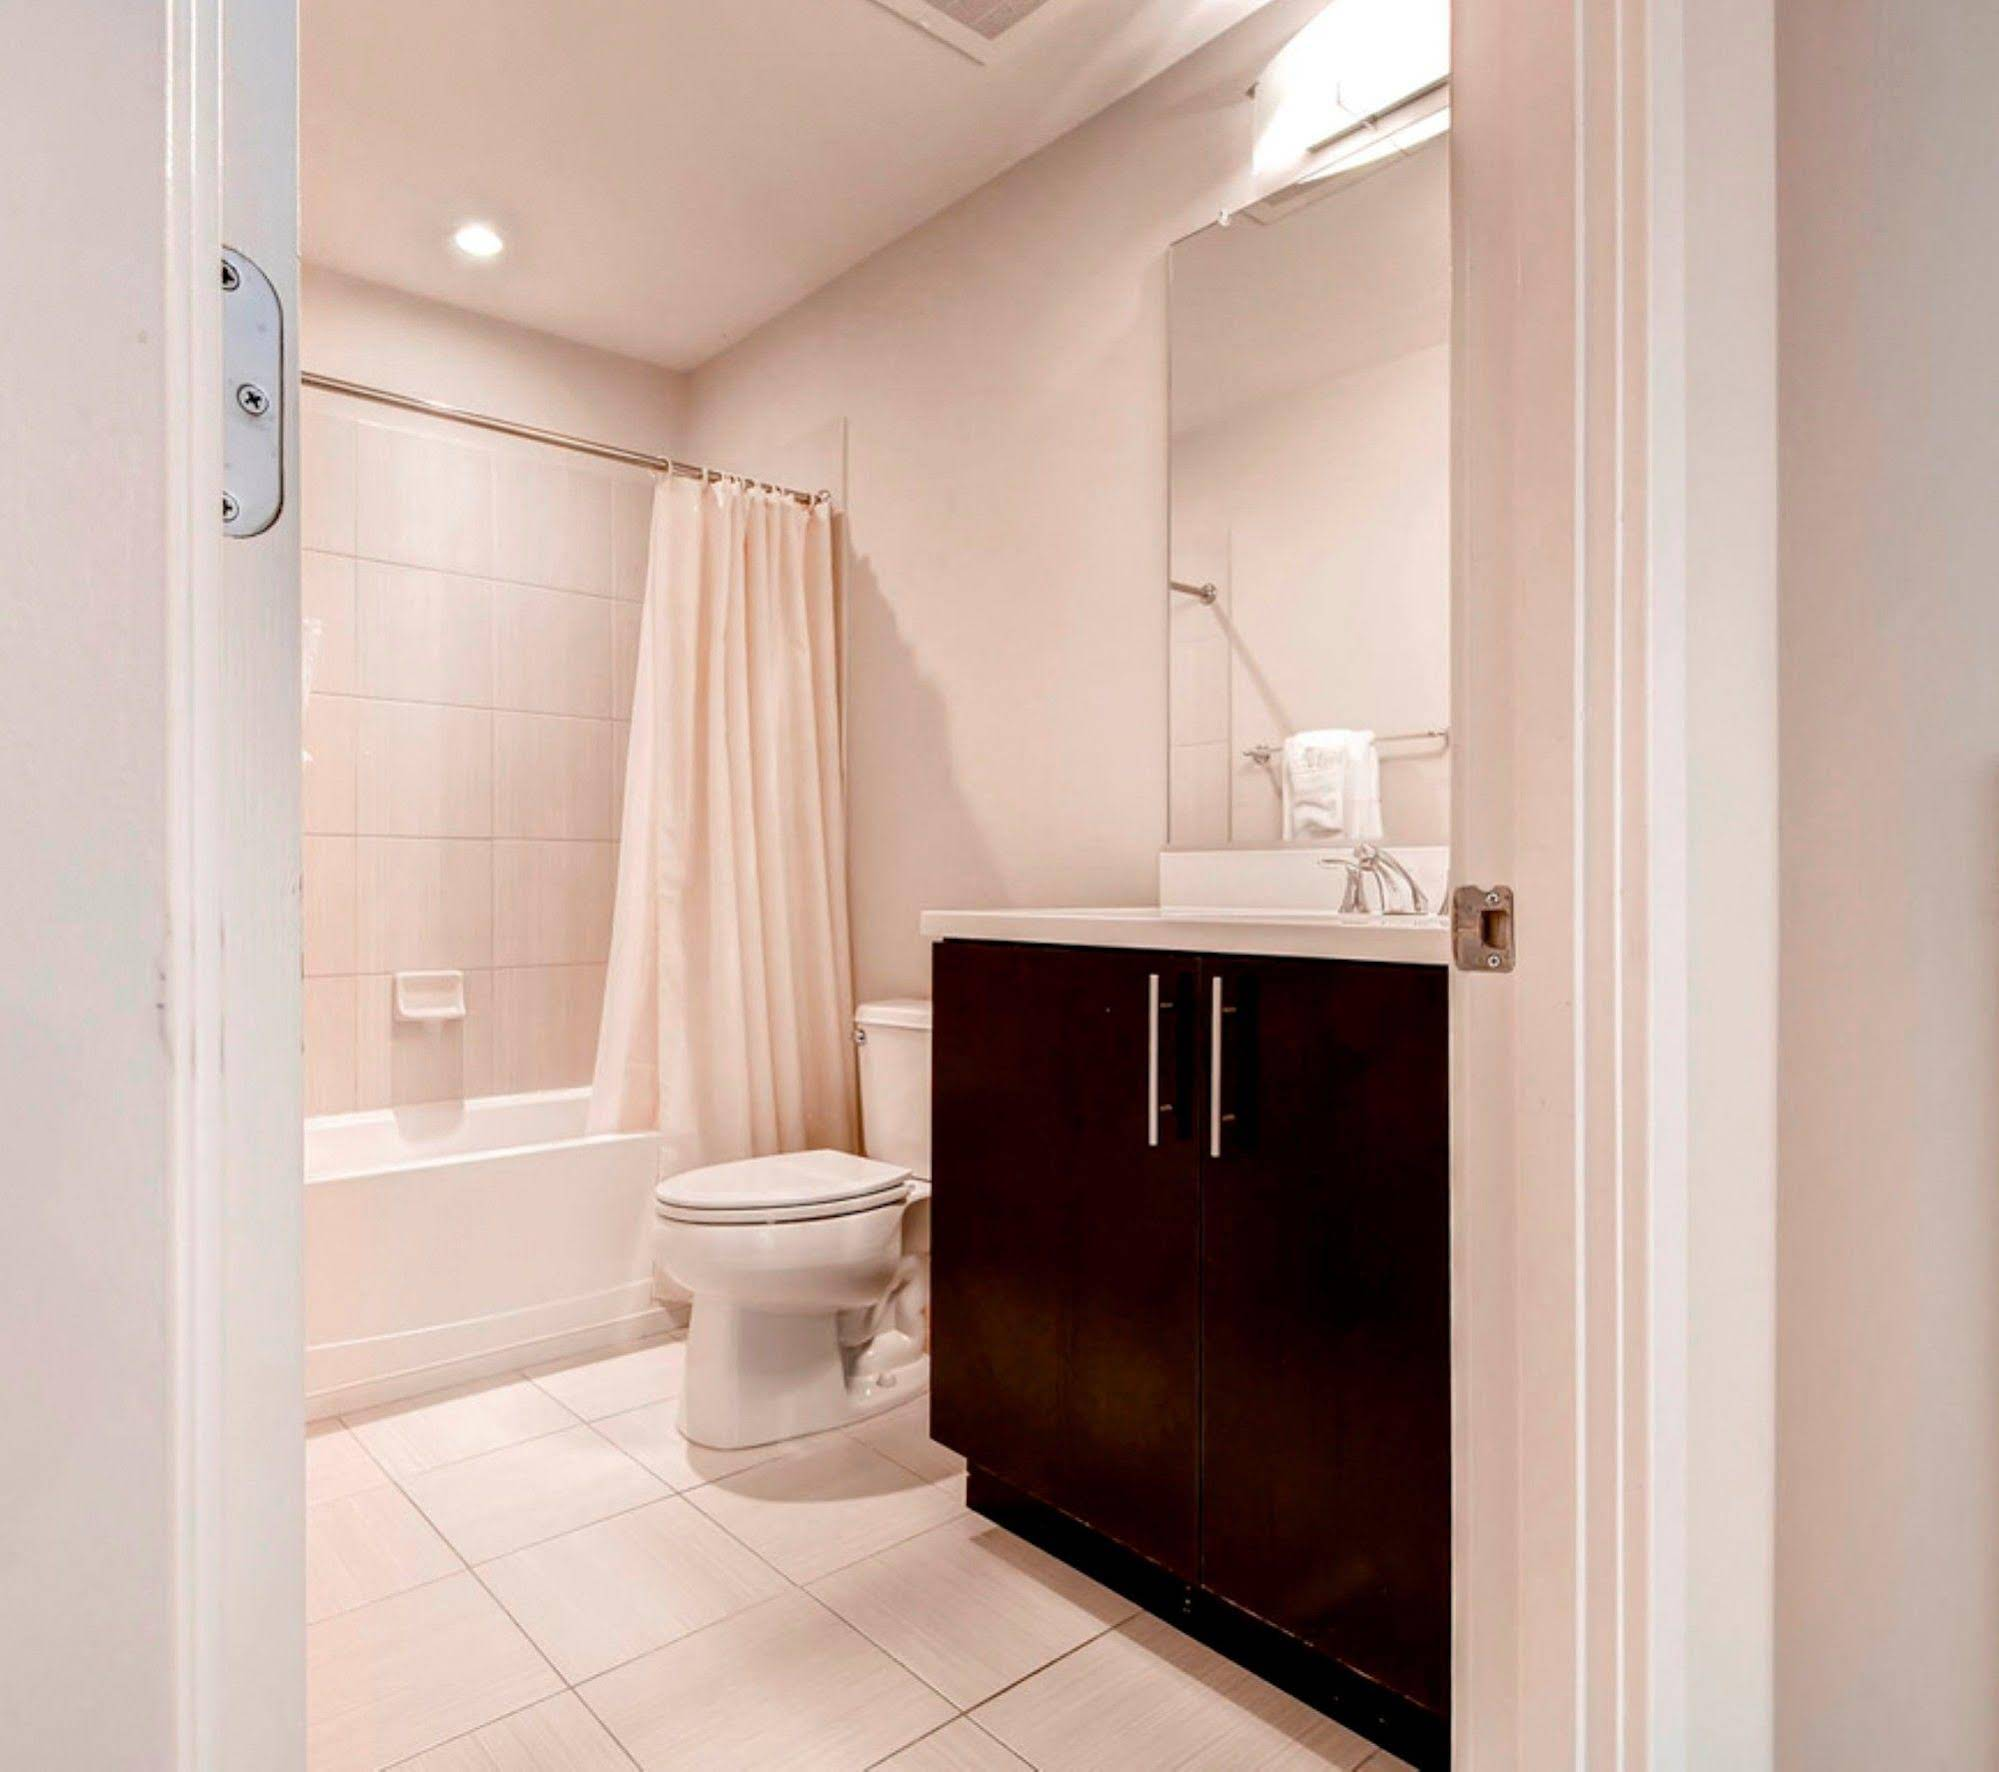 Global Luxury Suites at Villa Street